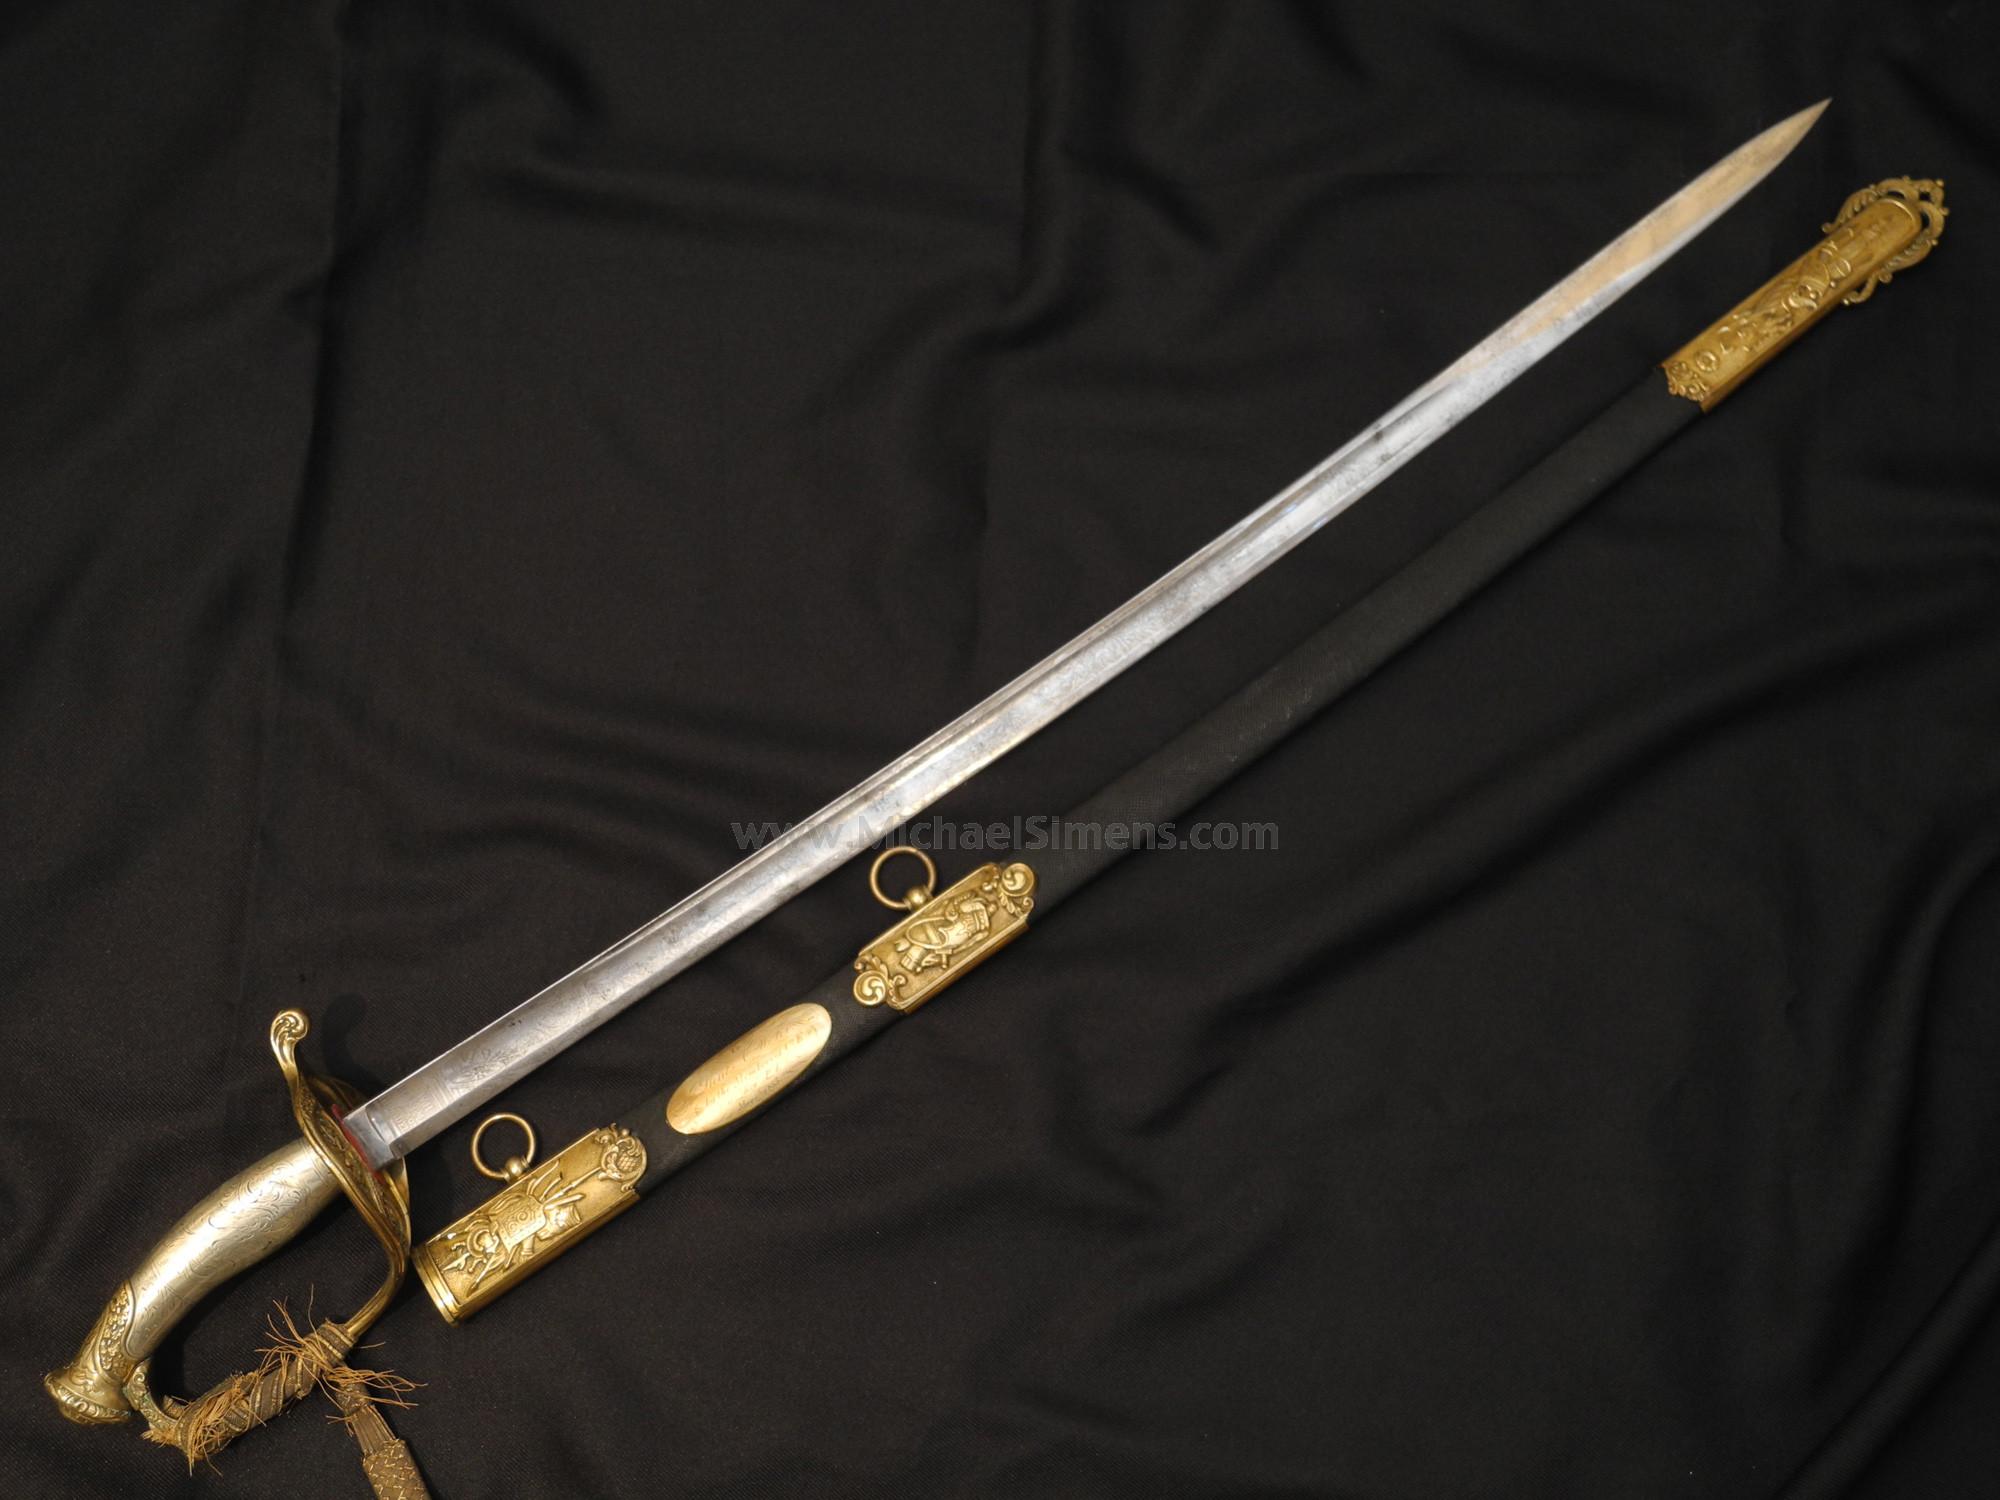 Civil War presentation sword of Lieut. A.W. Fix, 114th Pennsylvania volunteers